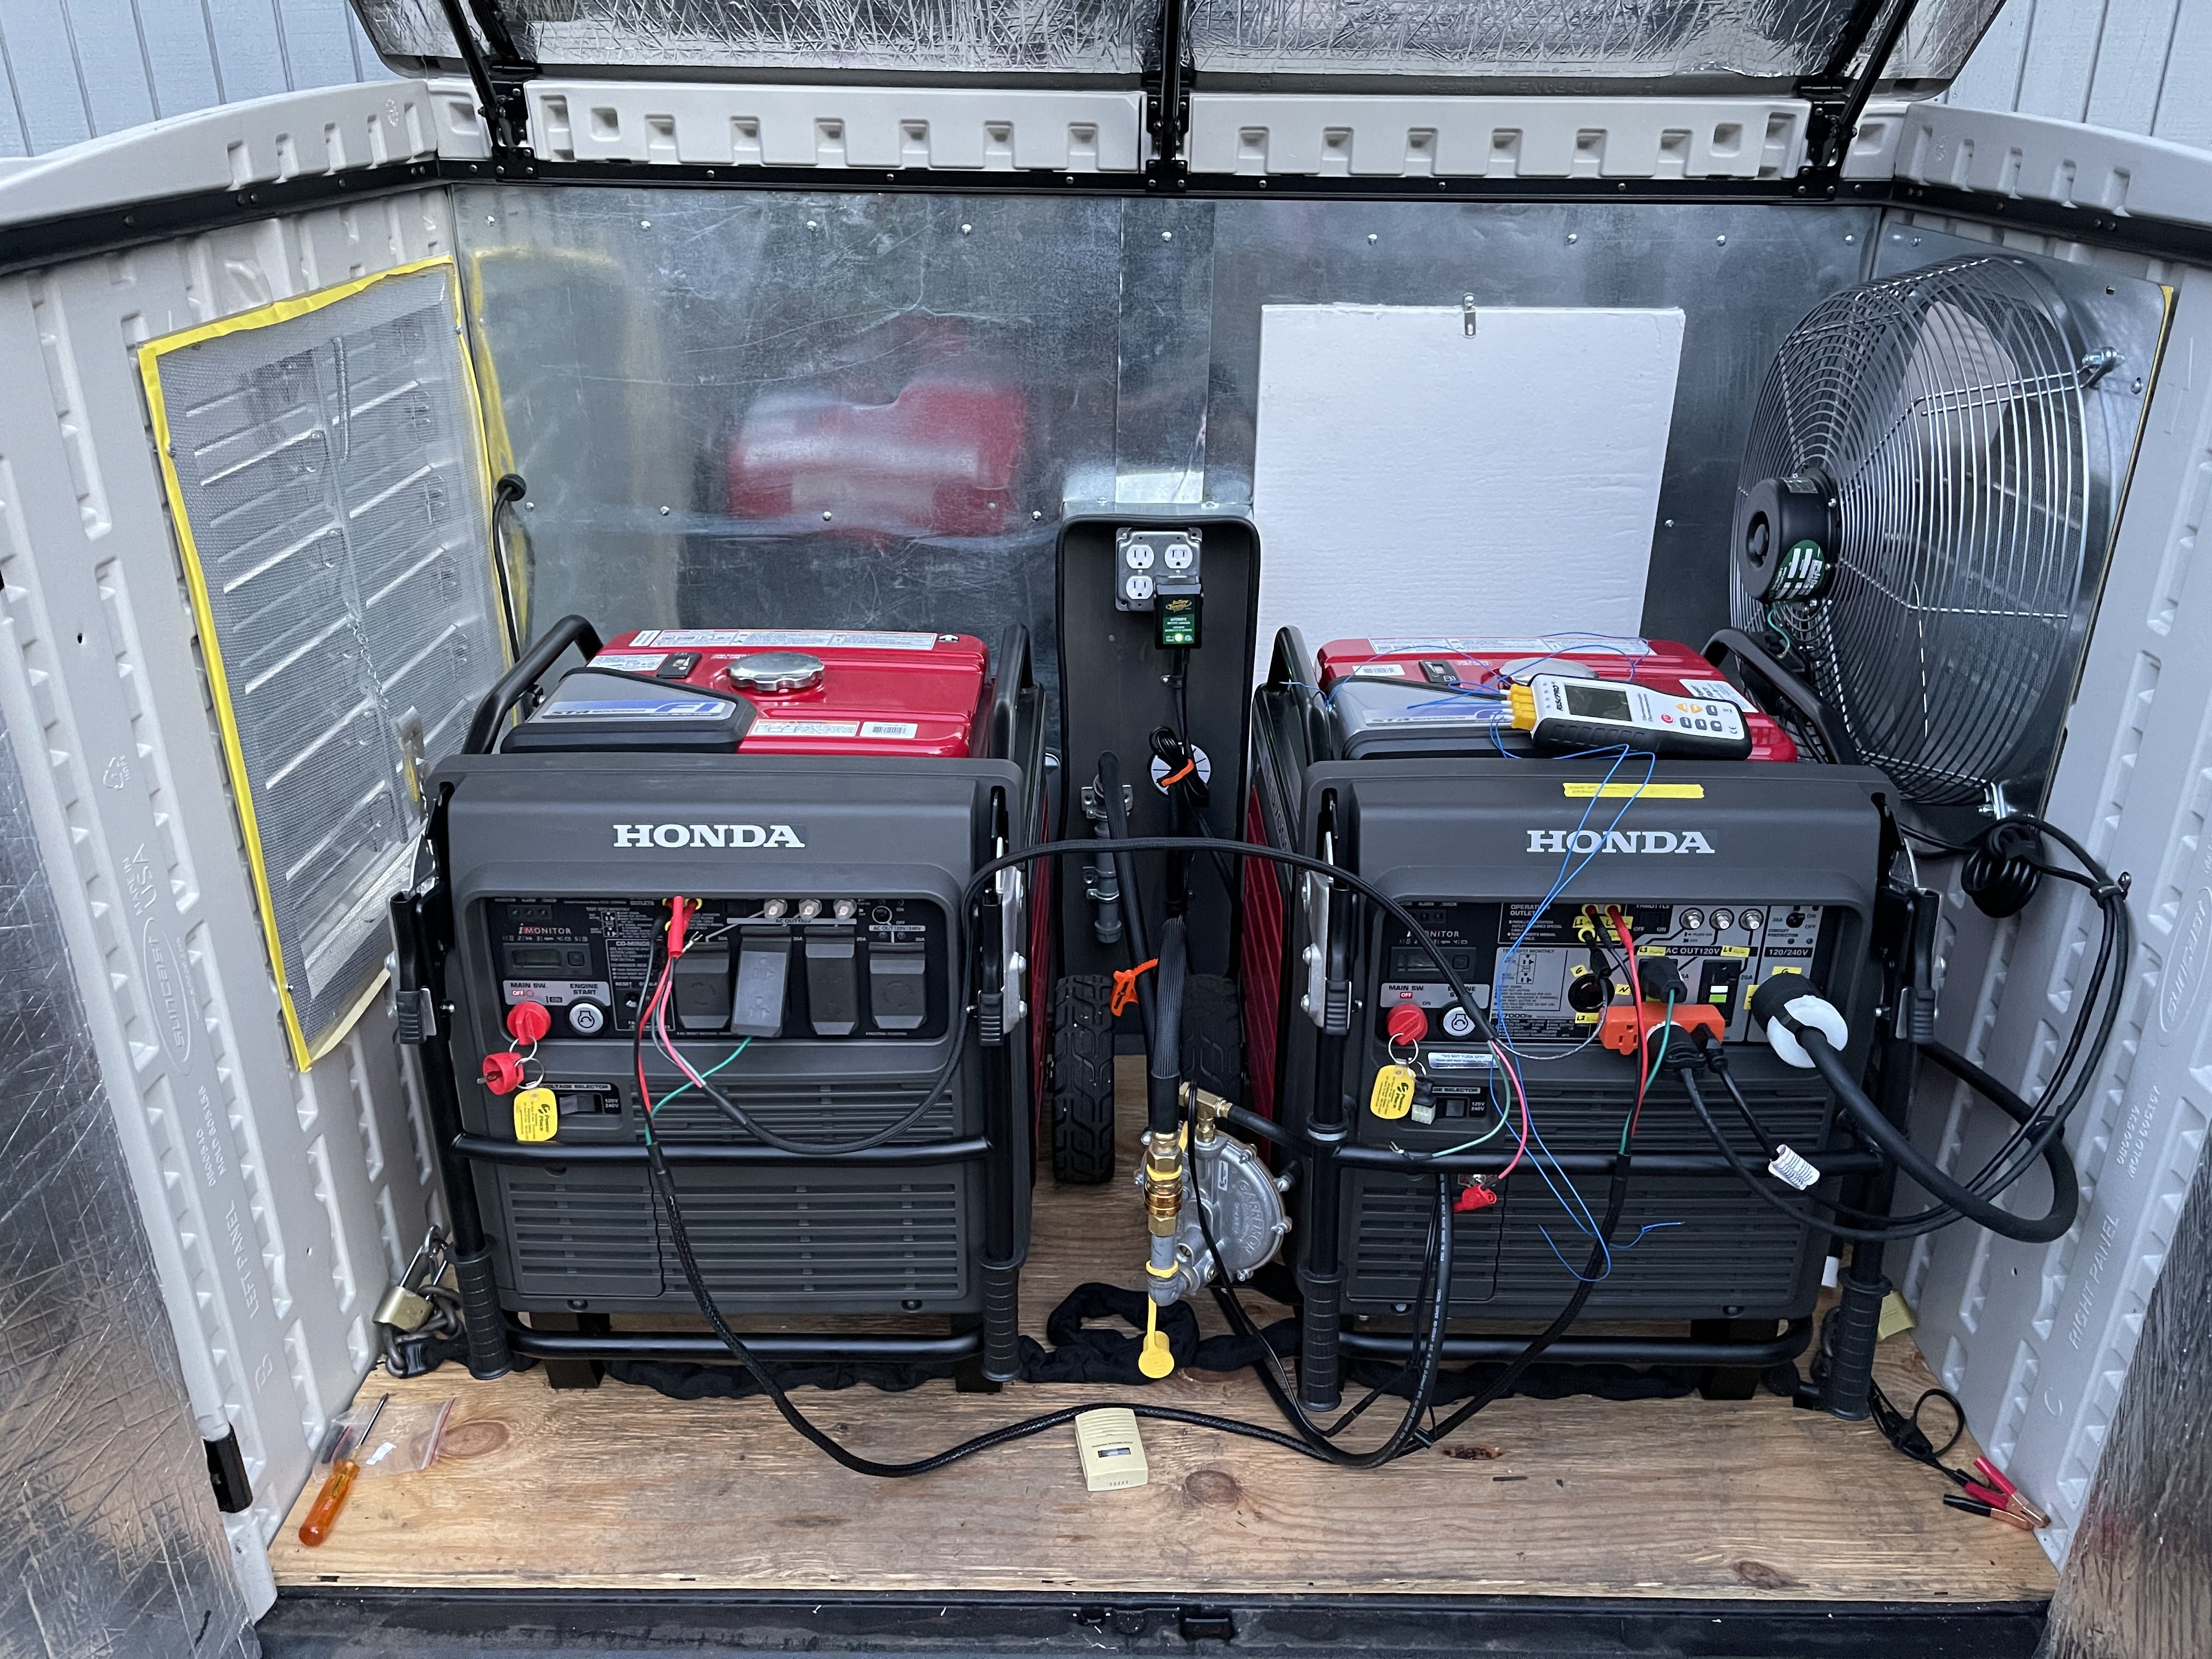 www.powerequipmentforum.com